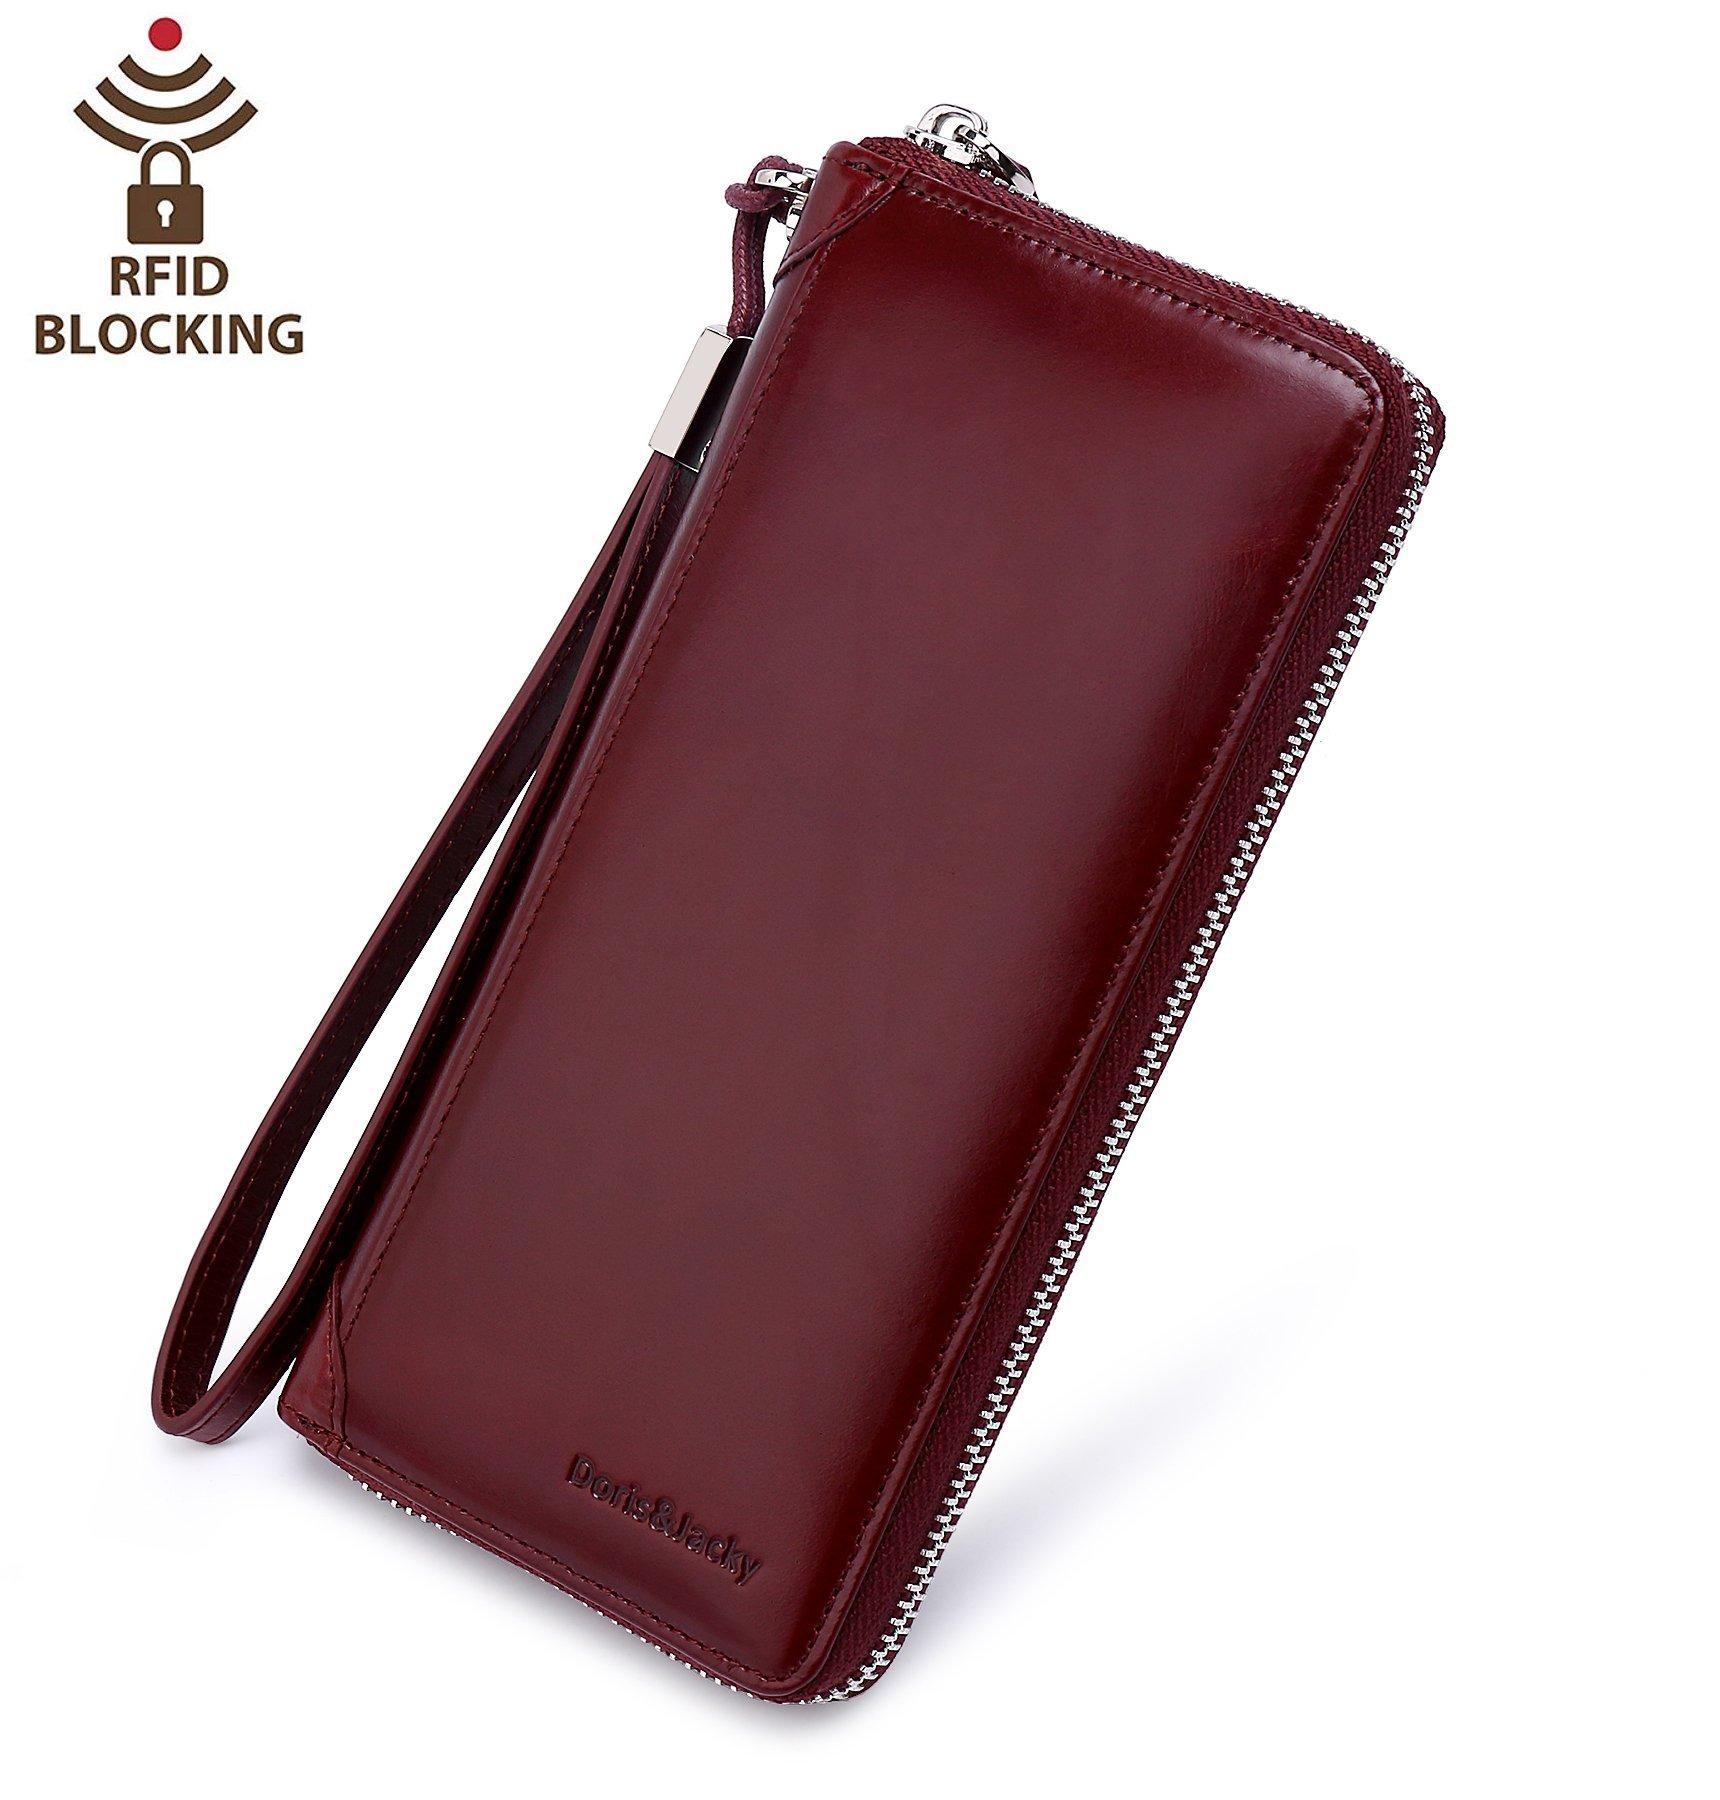 Women Zippered Wax Genuine Leather Wallet RFID Blocking Clutch With Wrist Strap (Wine red)